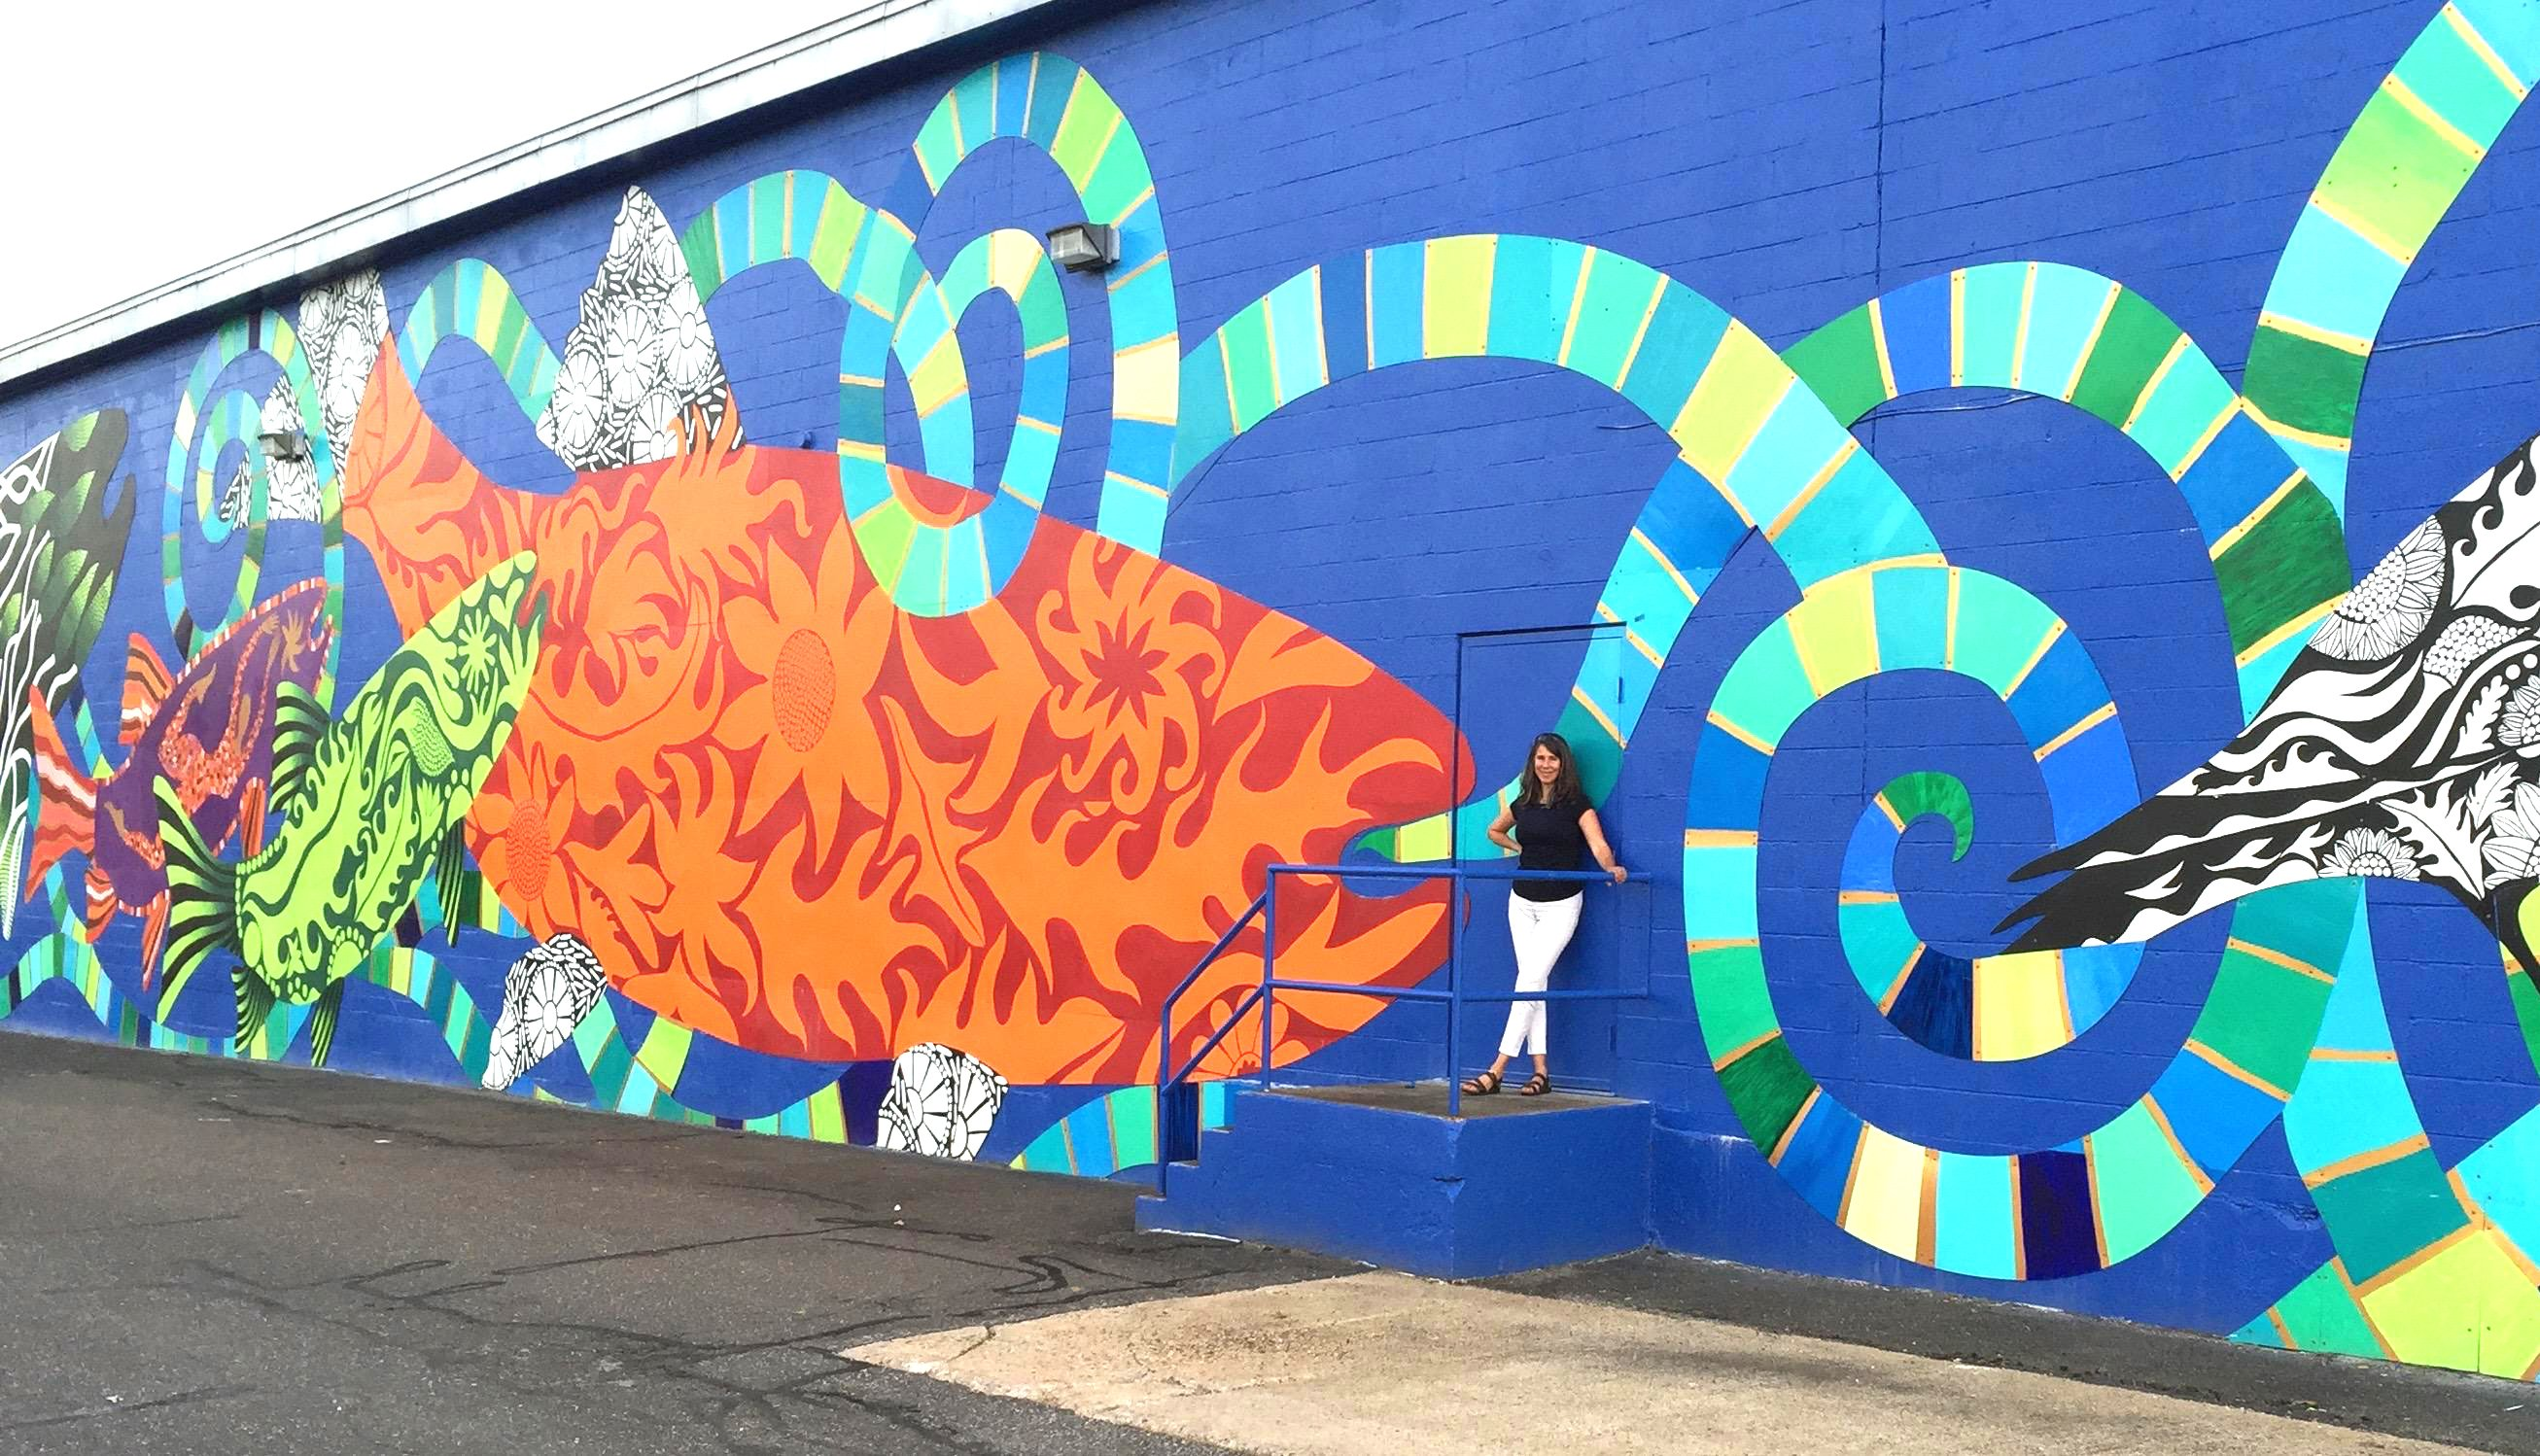 Danielle Mailer FishTales mural in Torrington Connecticut